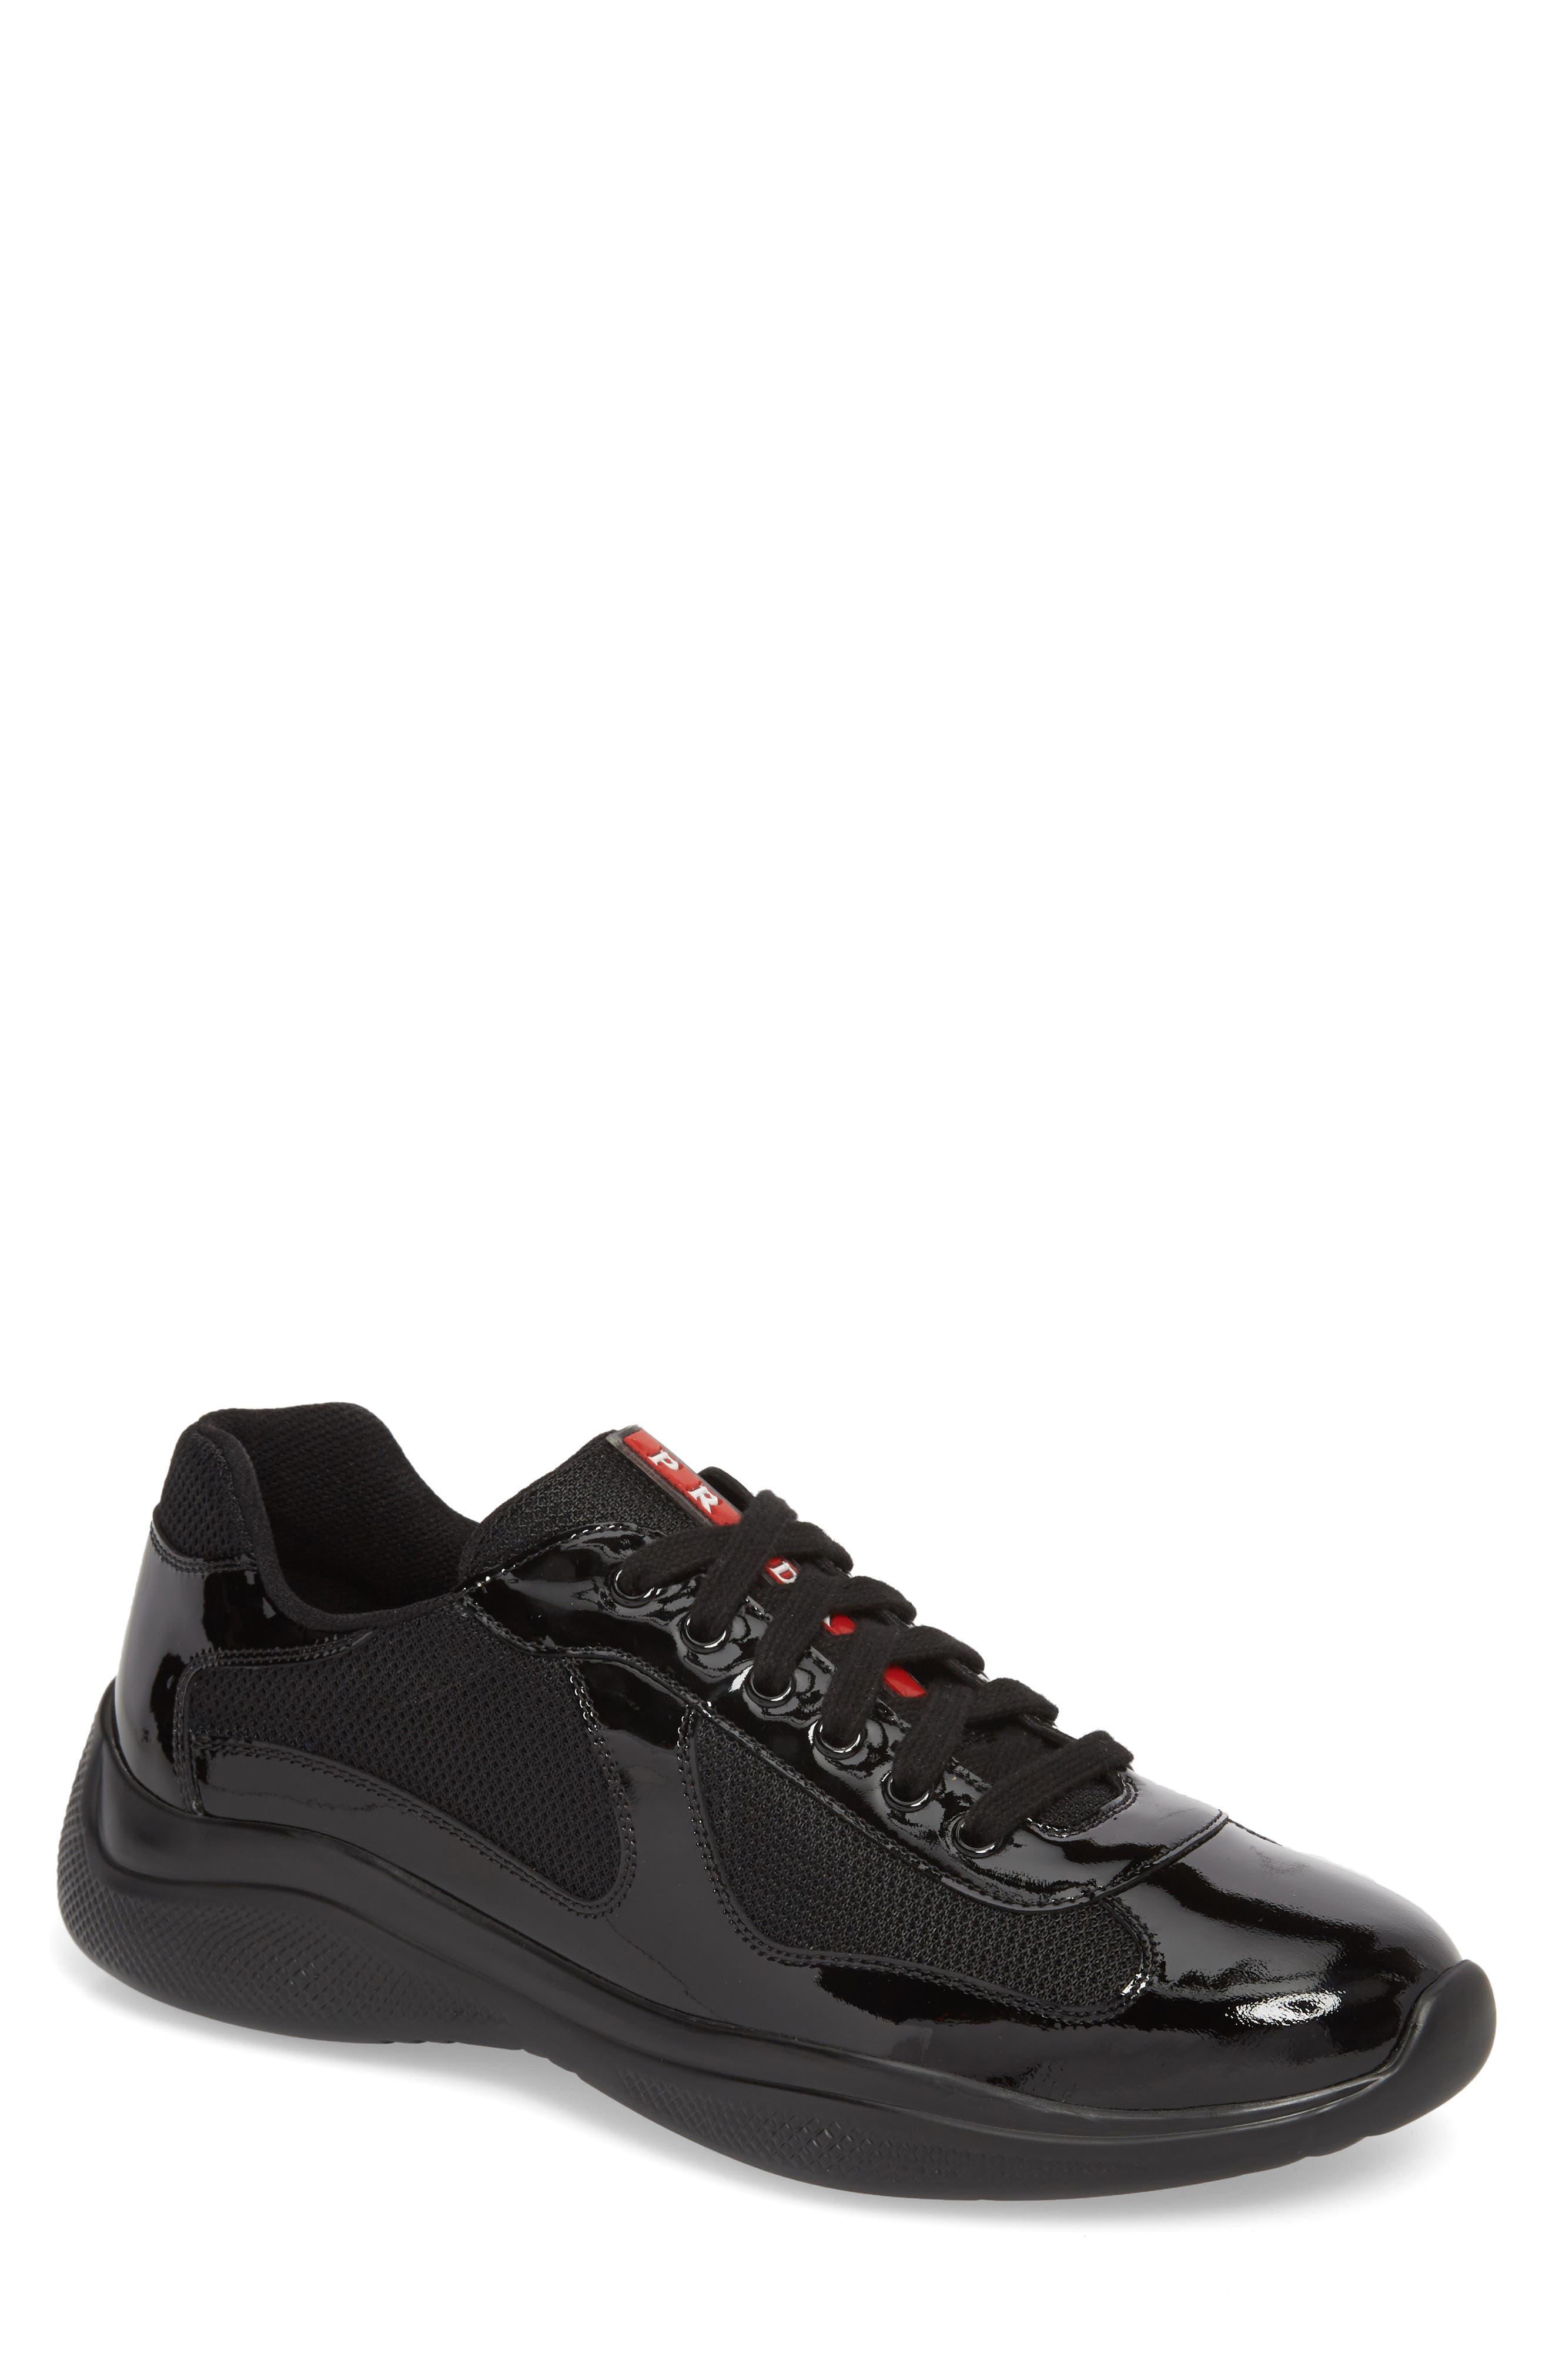 Americas Cup Sneaker,                             Main thumbnail 1, color,                             NERO/ ARGENTO